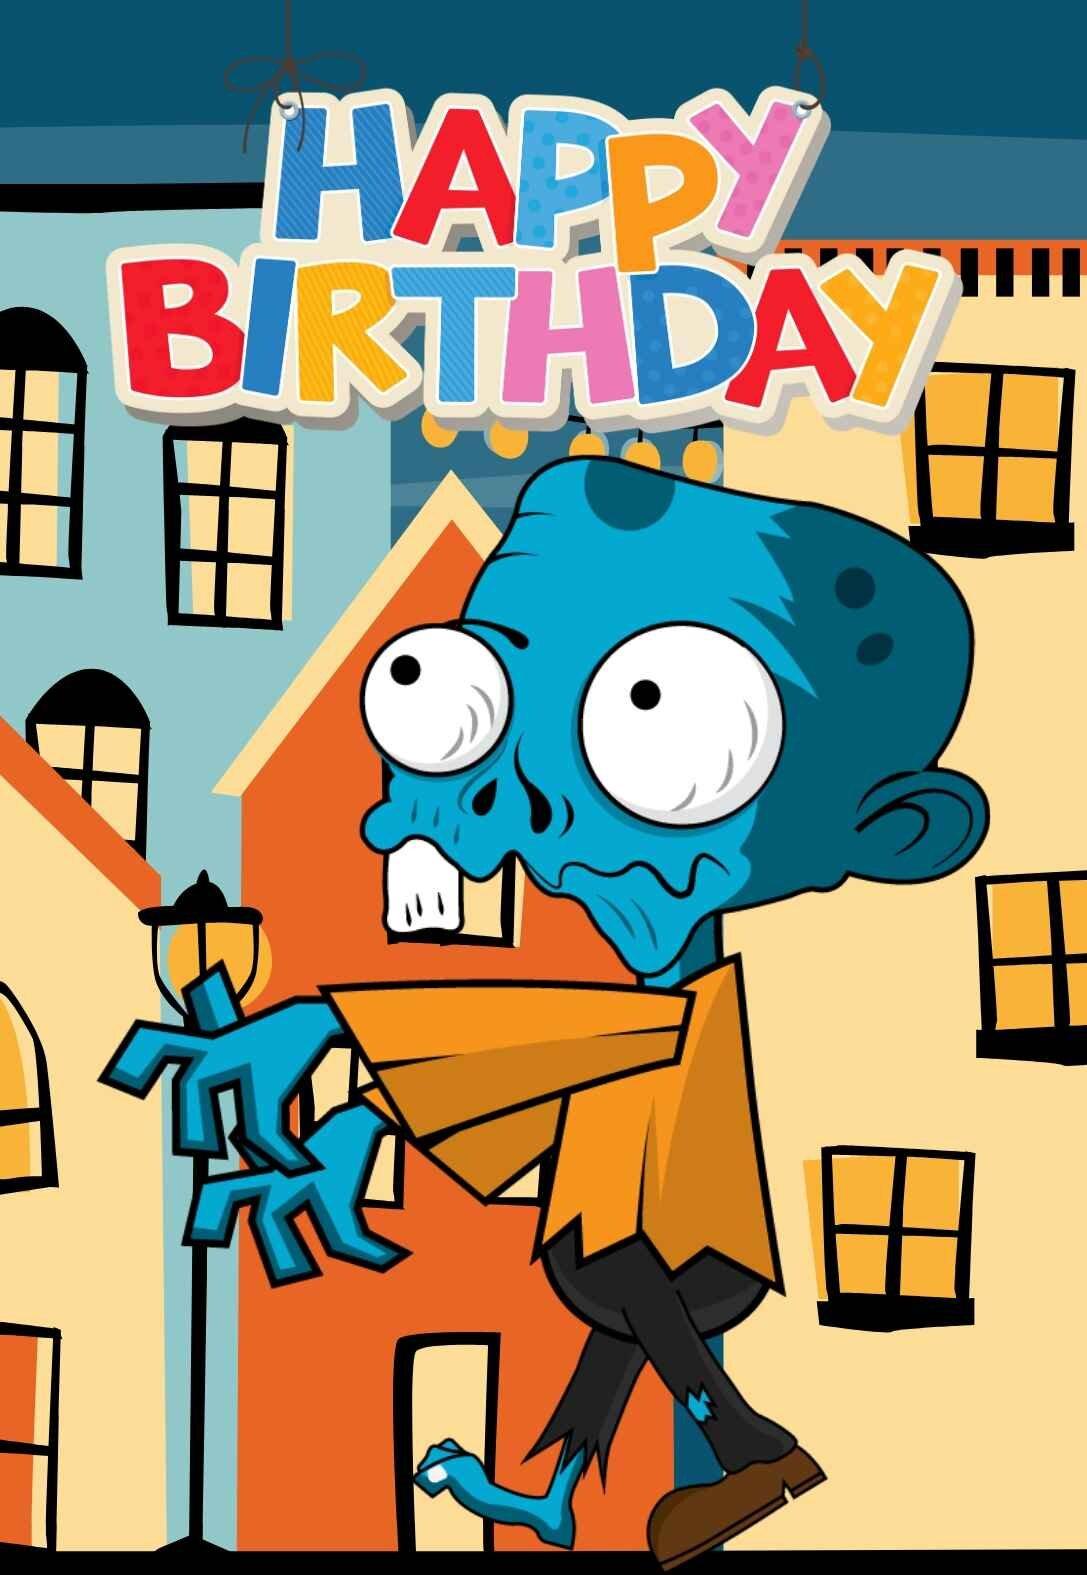 Zombie Printable Birthday Cards — PRINTBIRTHDAY.CARDS